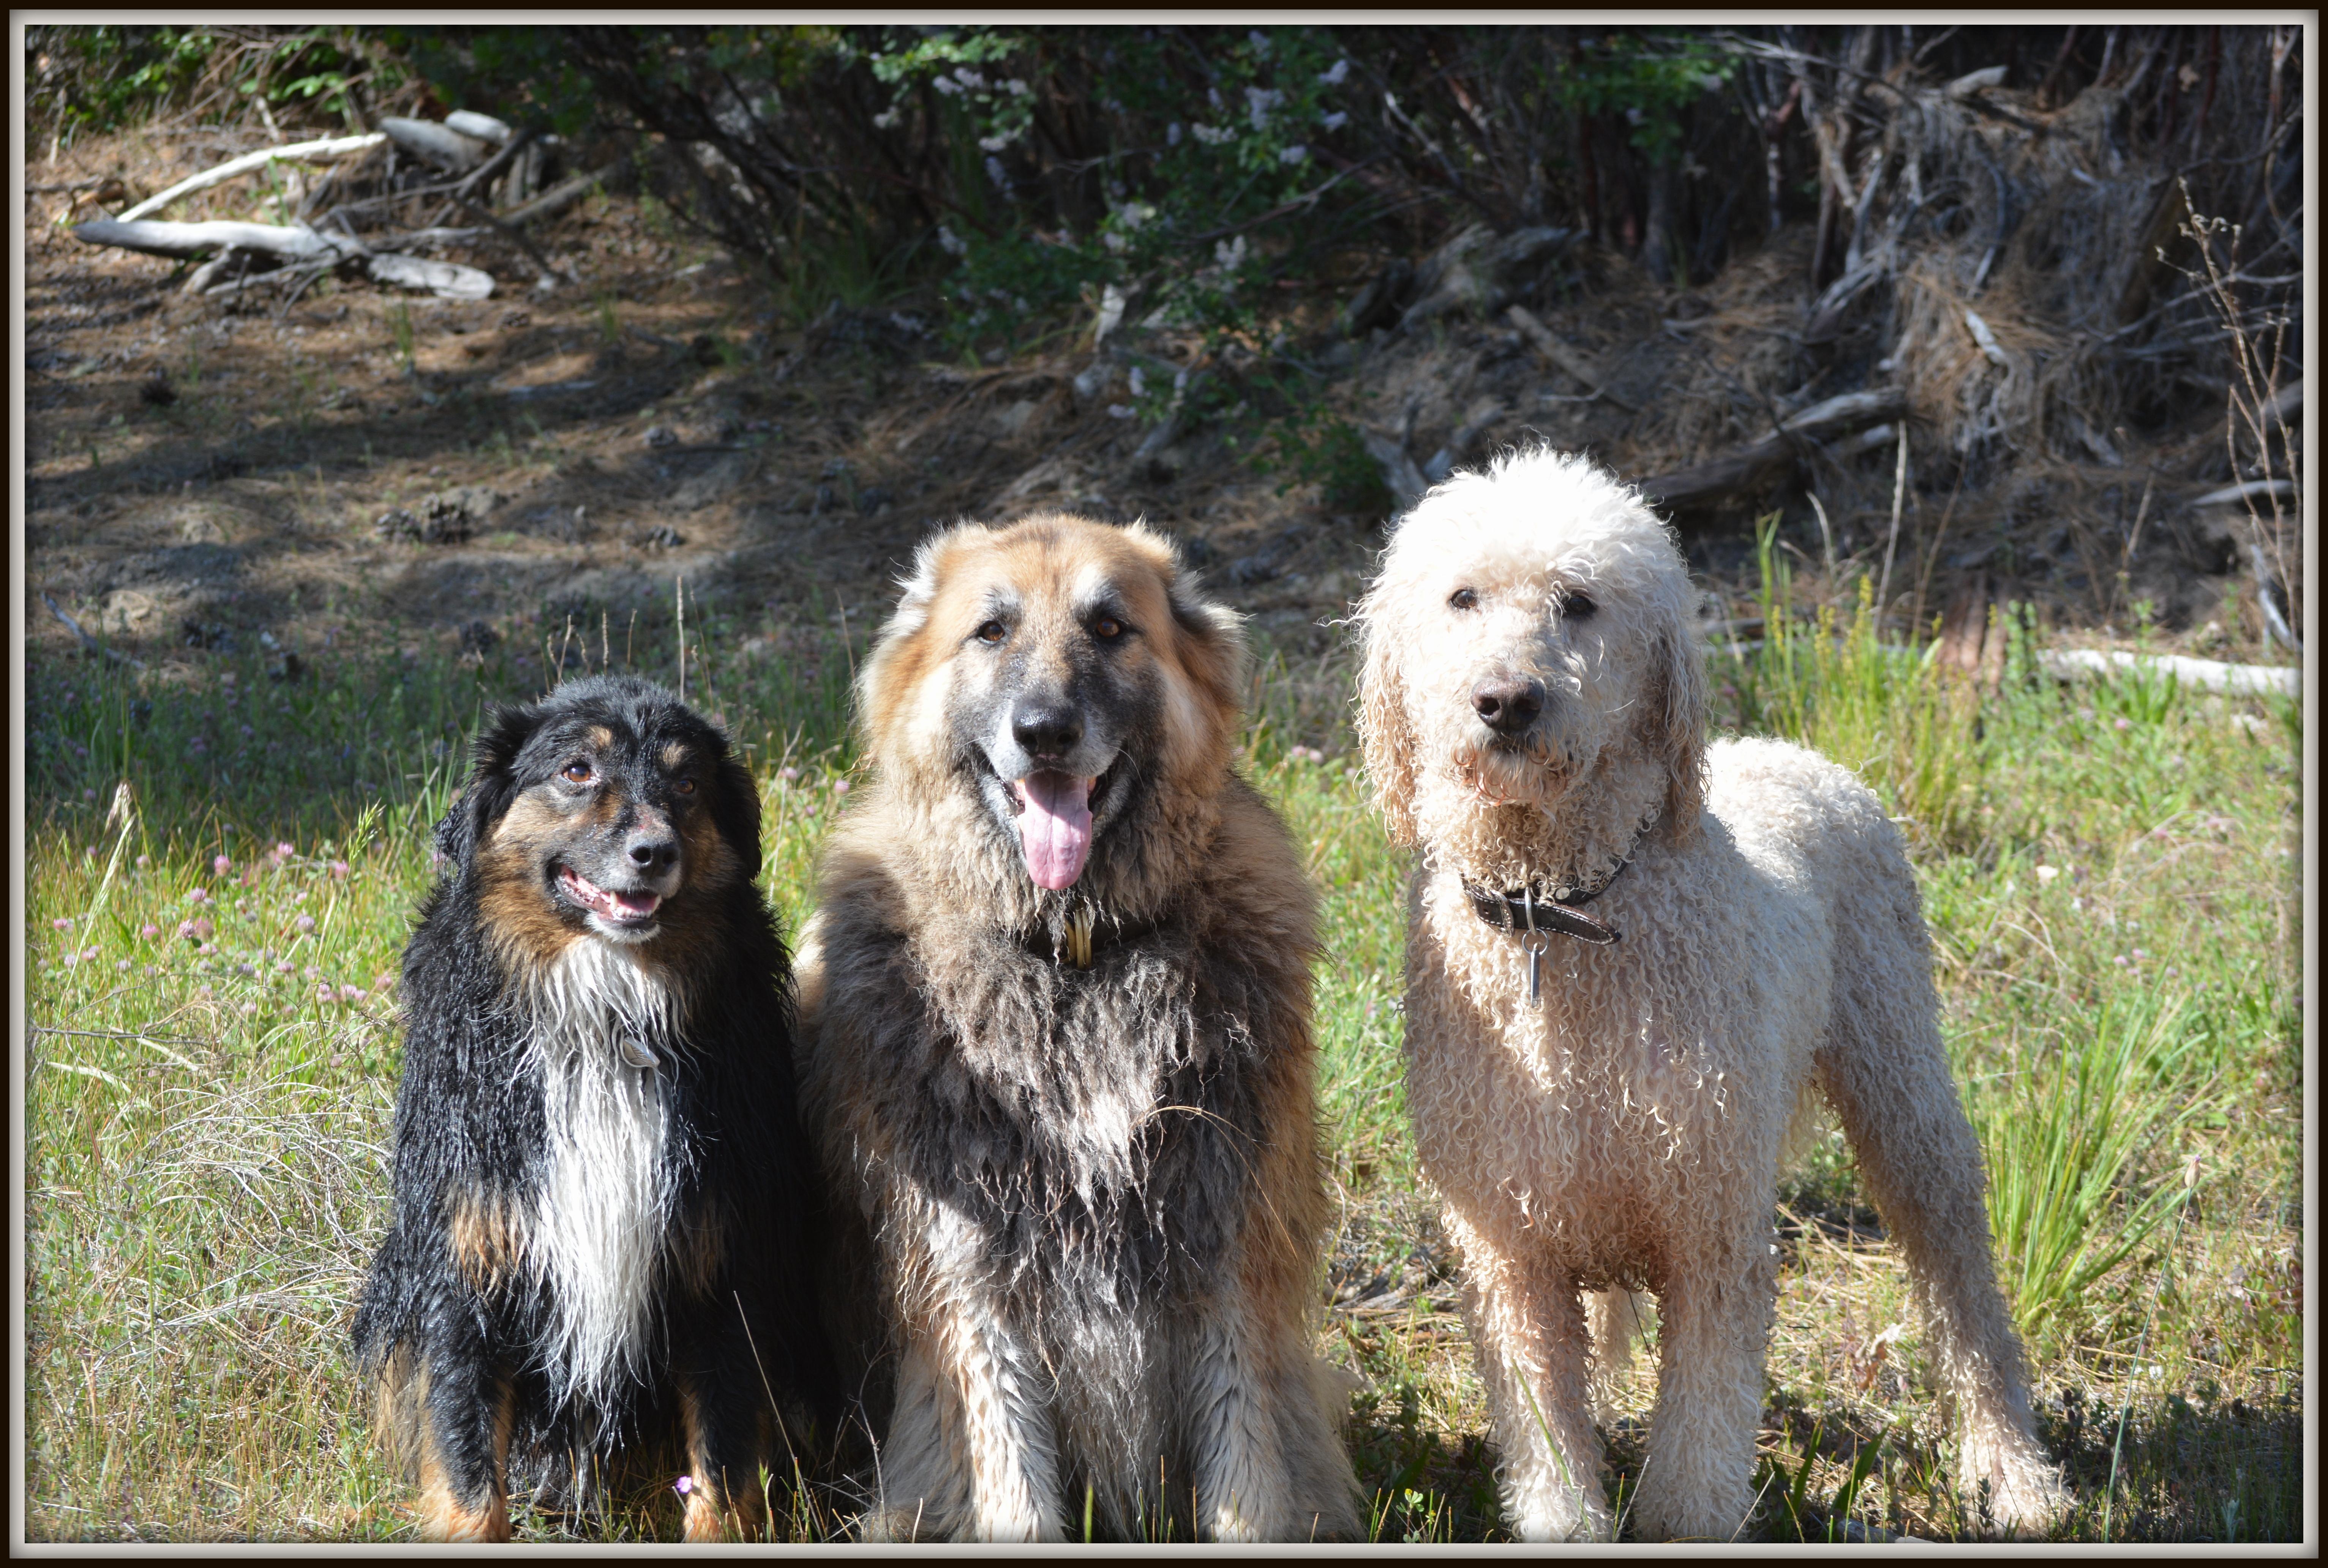 Bob, Ba and Poo